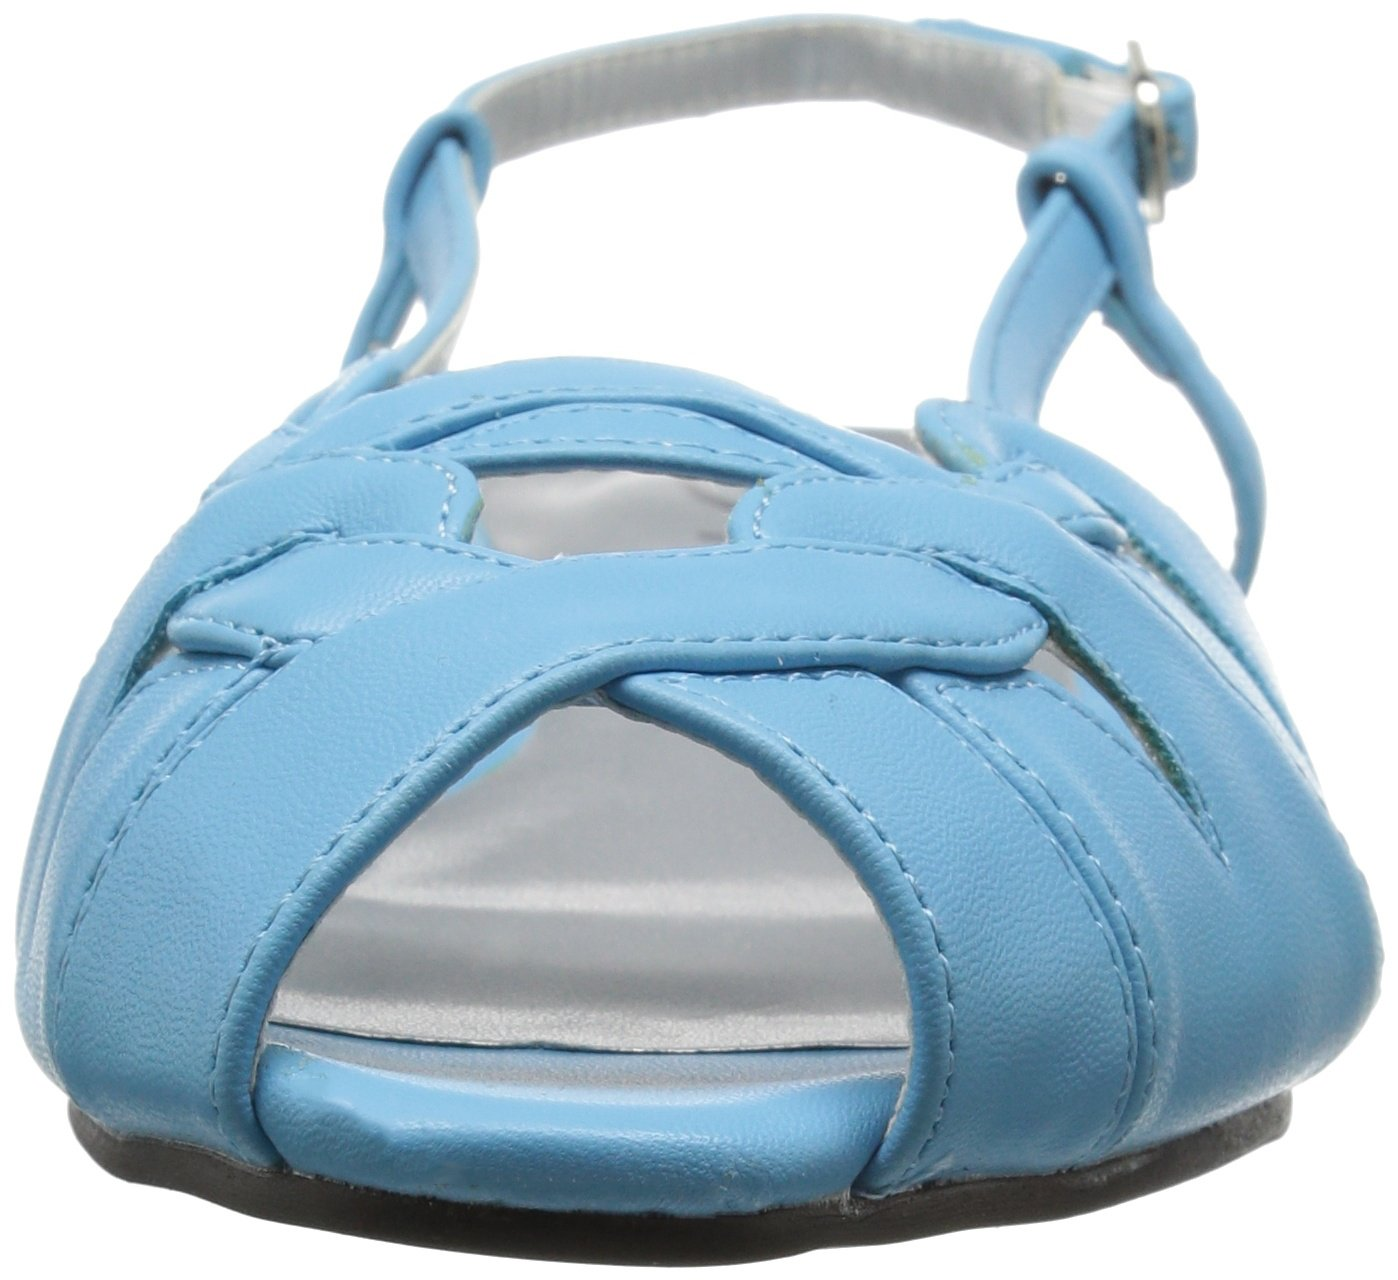 Annie Shoes Women's Kim Wide Calf Wedge Sandal B01GKEC9C6 6.5 W US|Navy